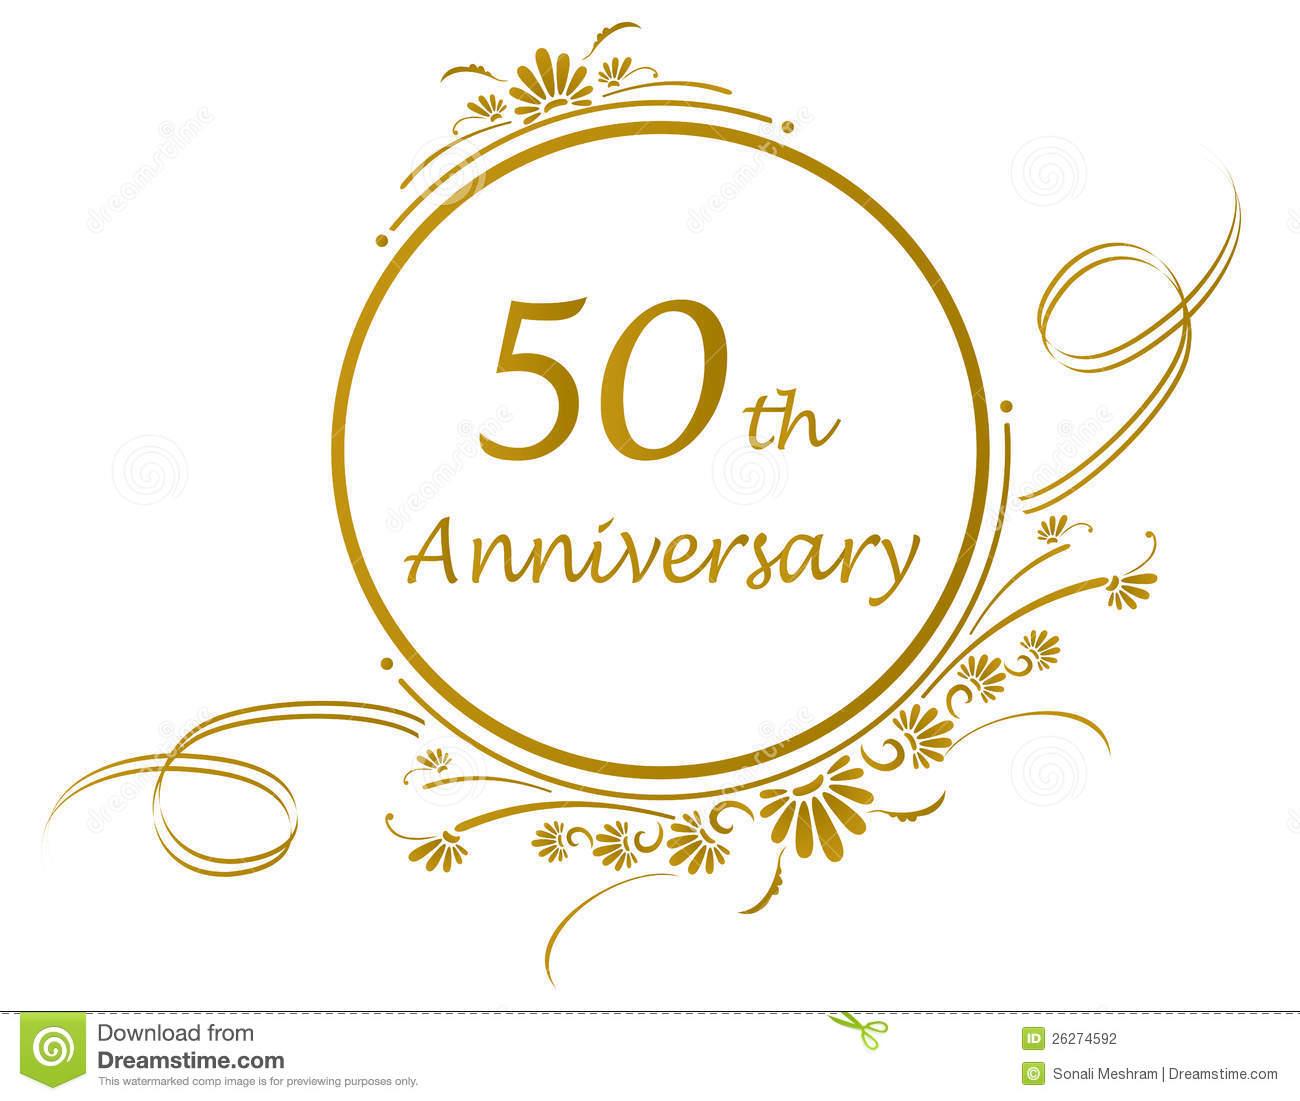 Happy 50th anniversary clipart jpg stock 50th Anniversary Clipart - Clipart Kid jpg stock